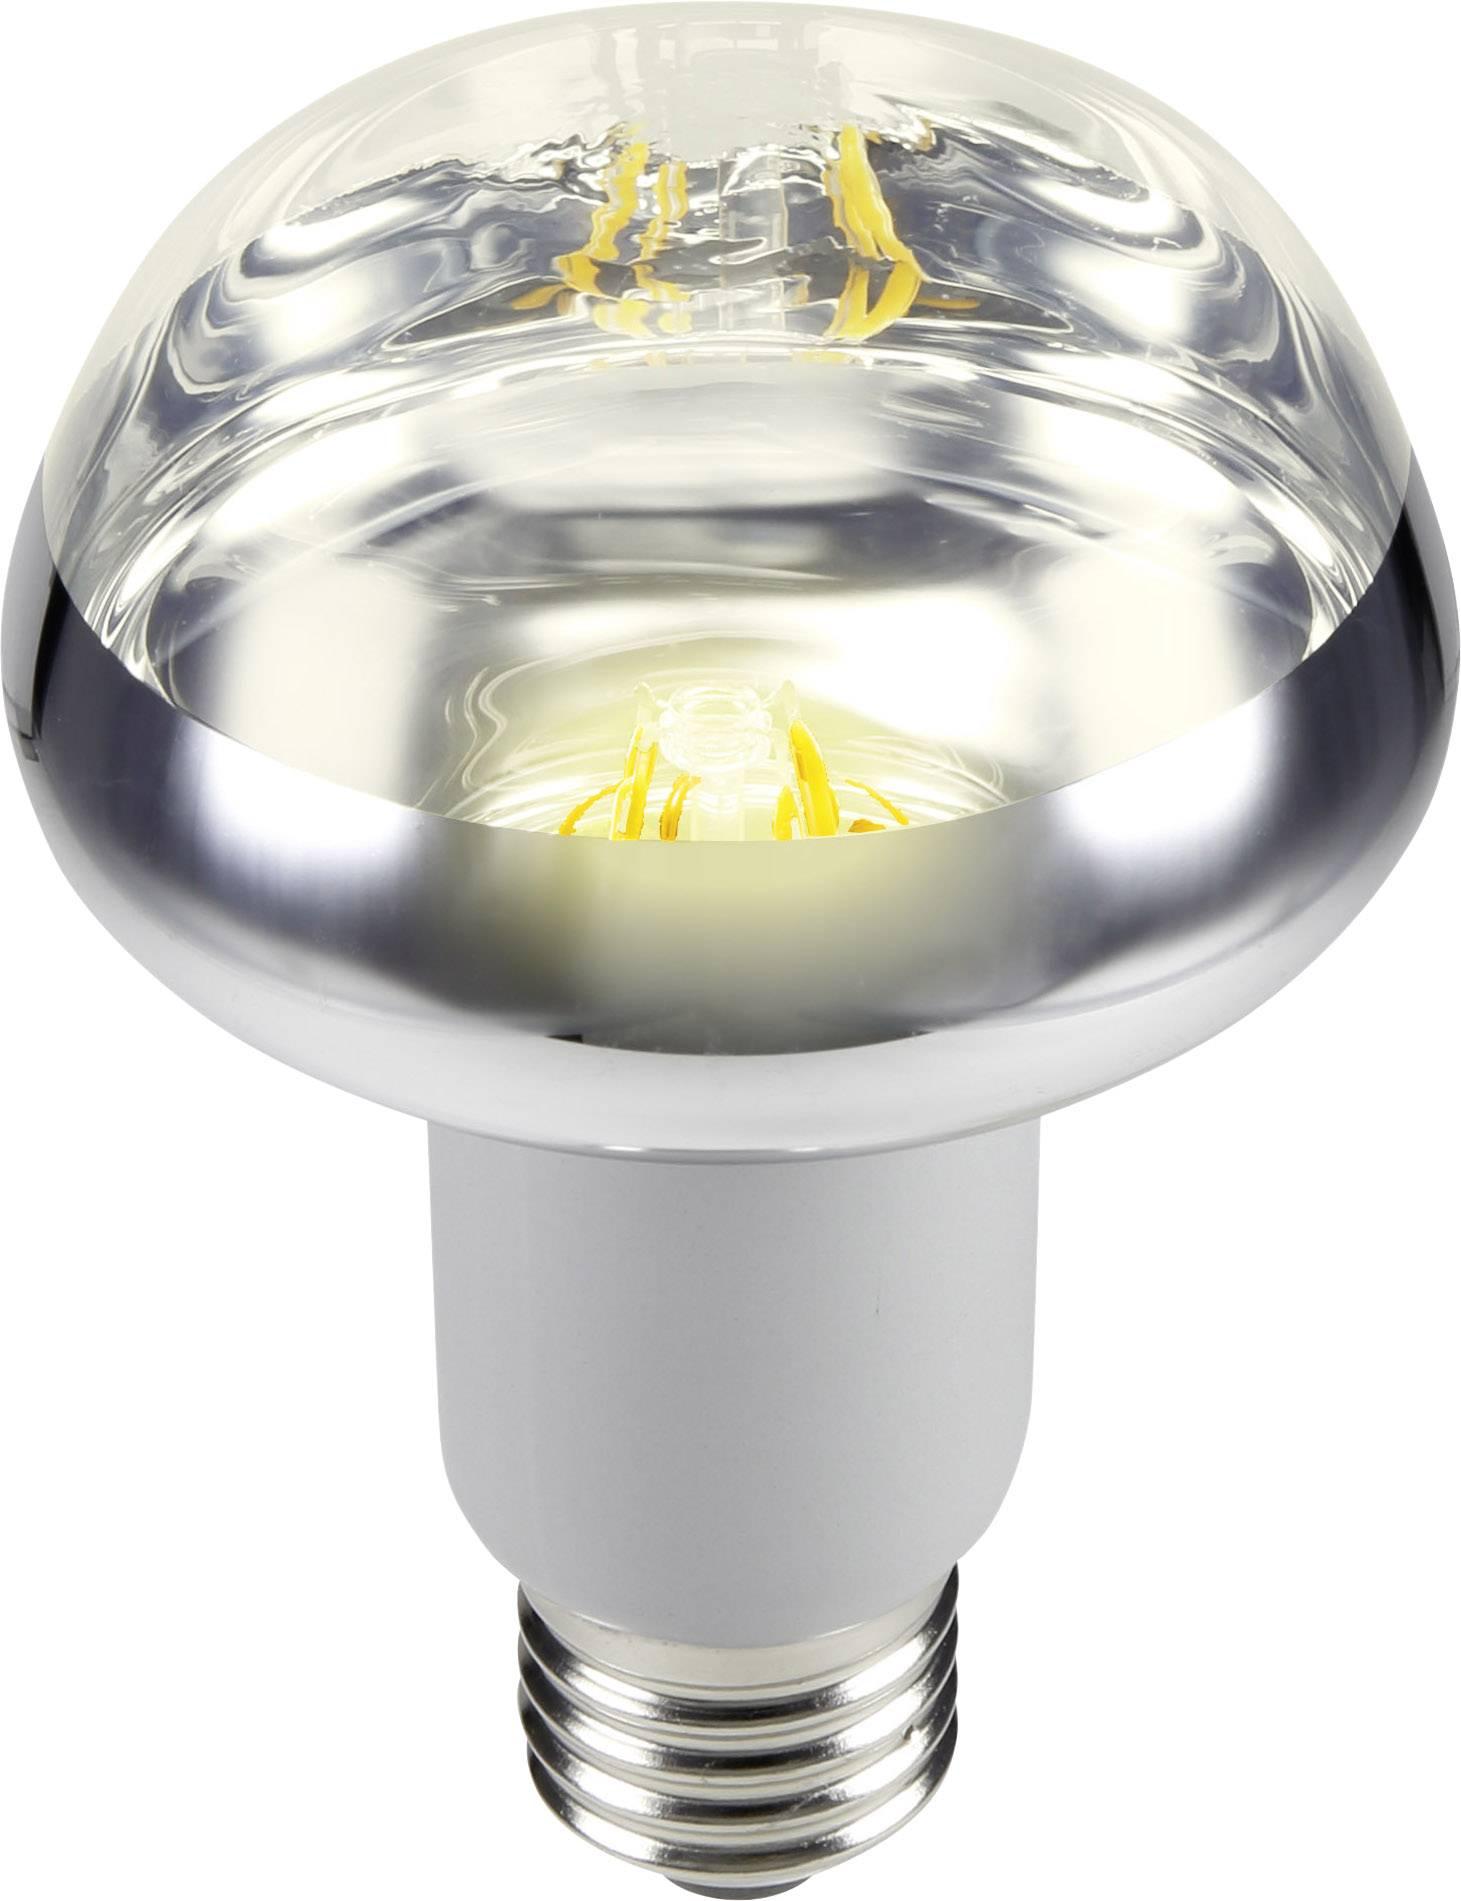 LED žiarovka 117 mm sygonix 230 V 5.5 W = 42 W vlákno 1 ks